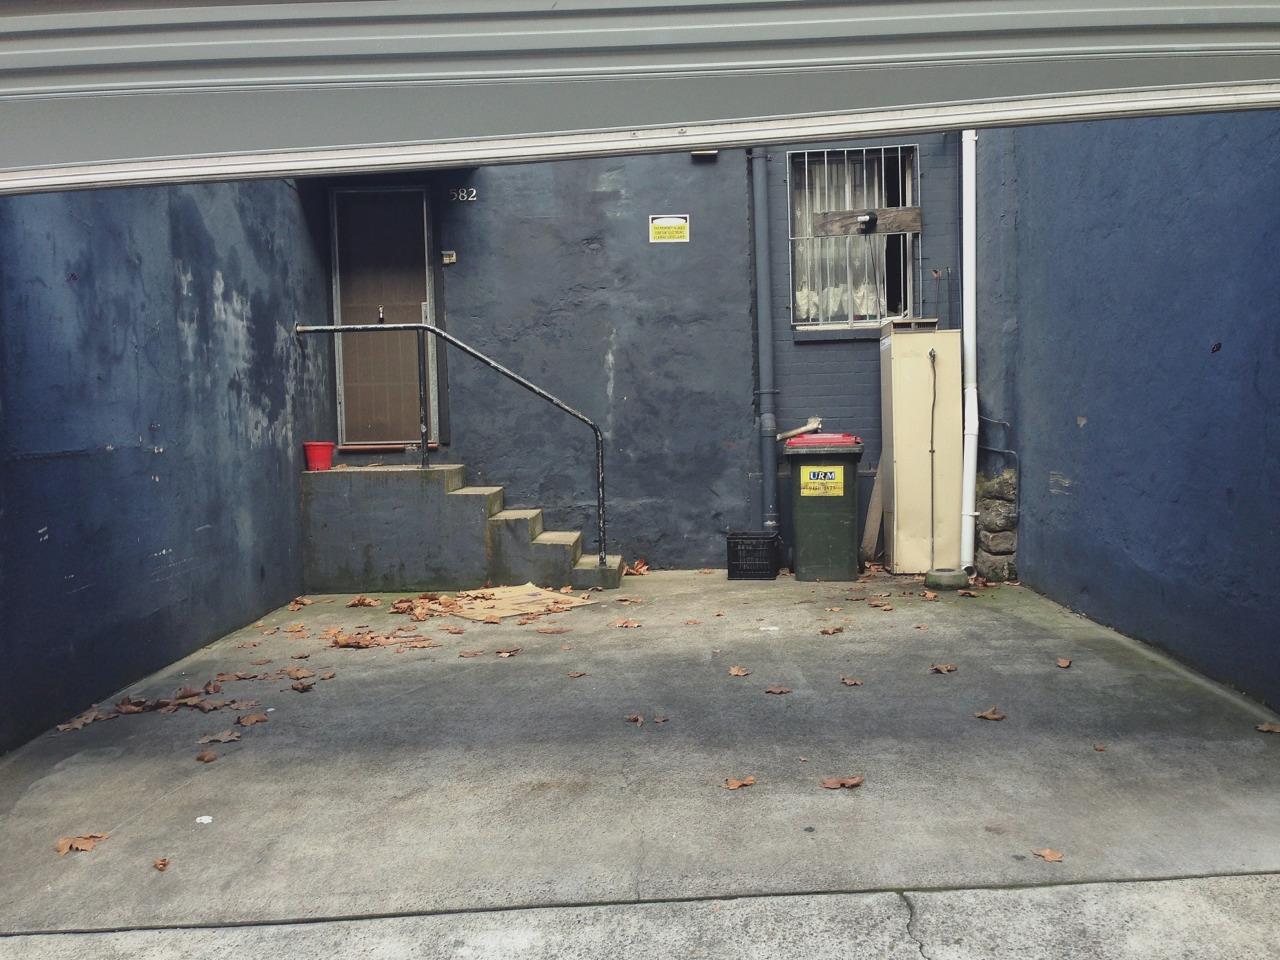 #backyardheadon #documentingspace #sydney